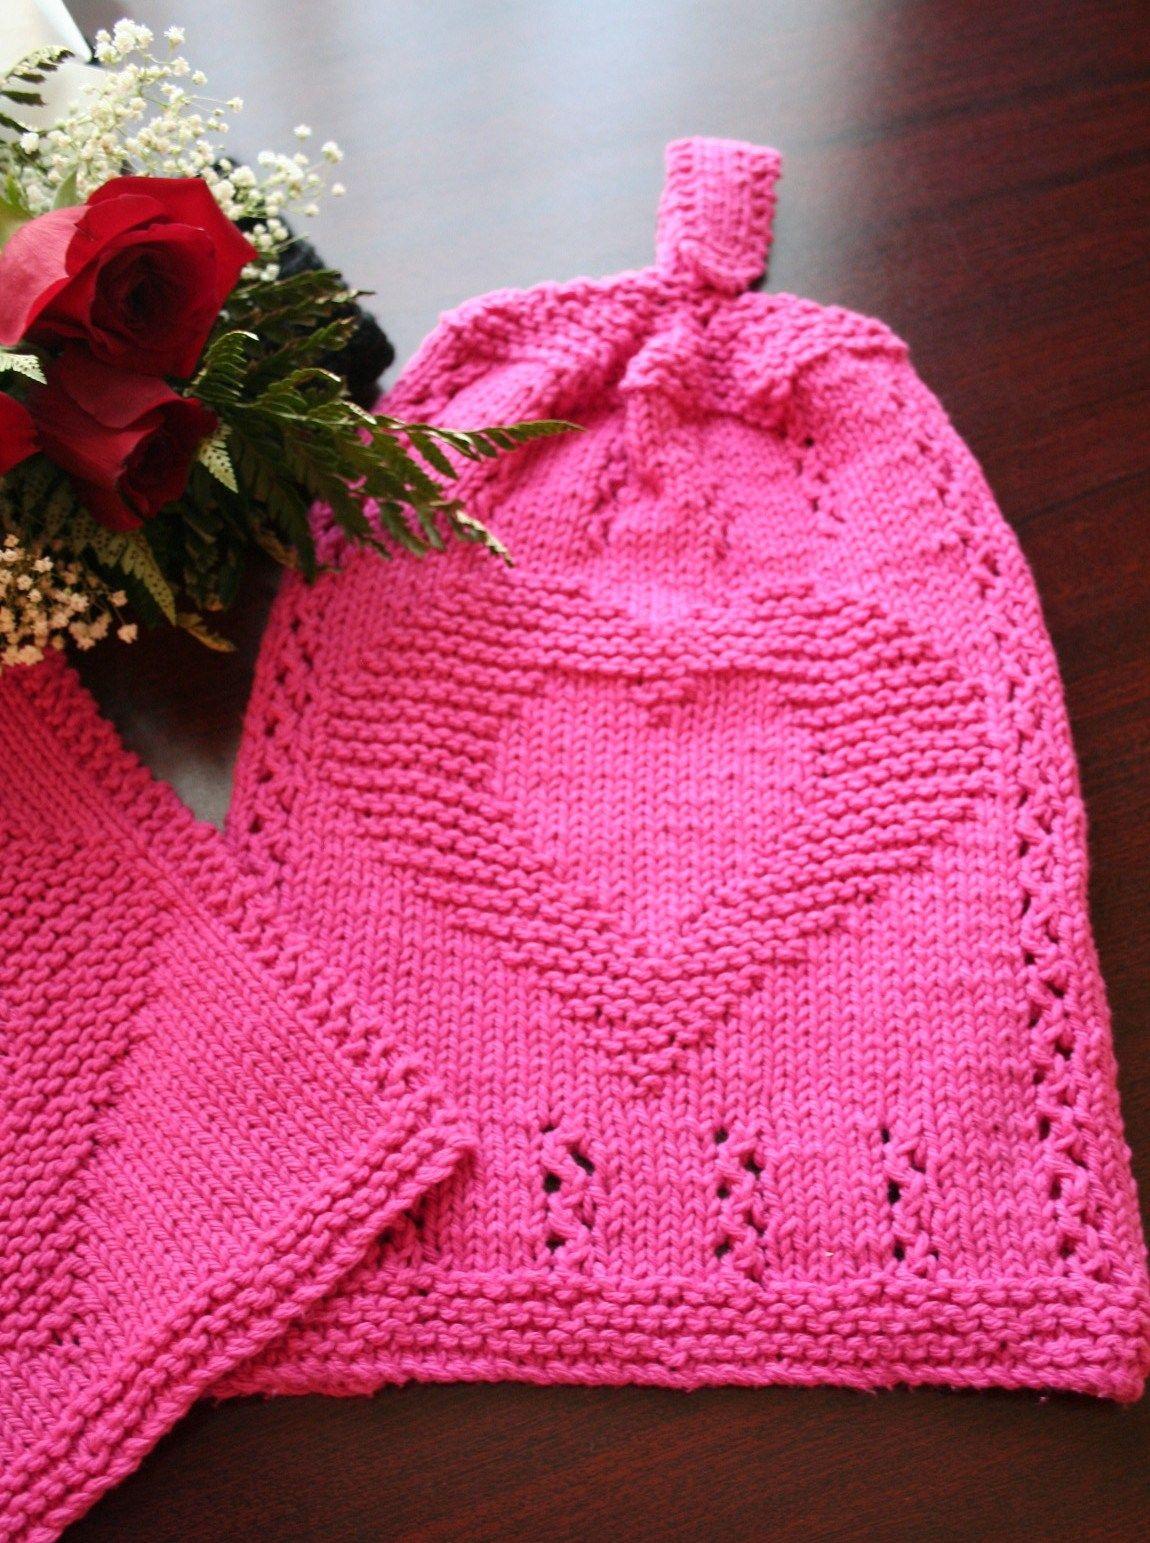 Dishcloth and Washcloth Knitting Patterns | Knitting patterns ...